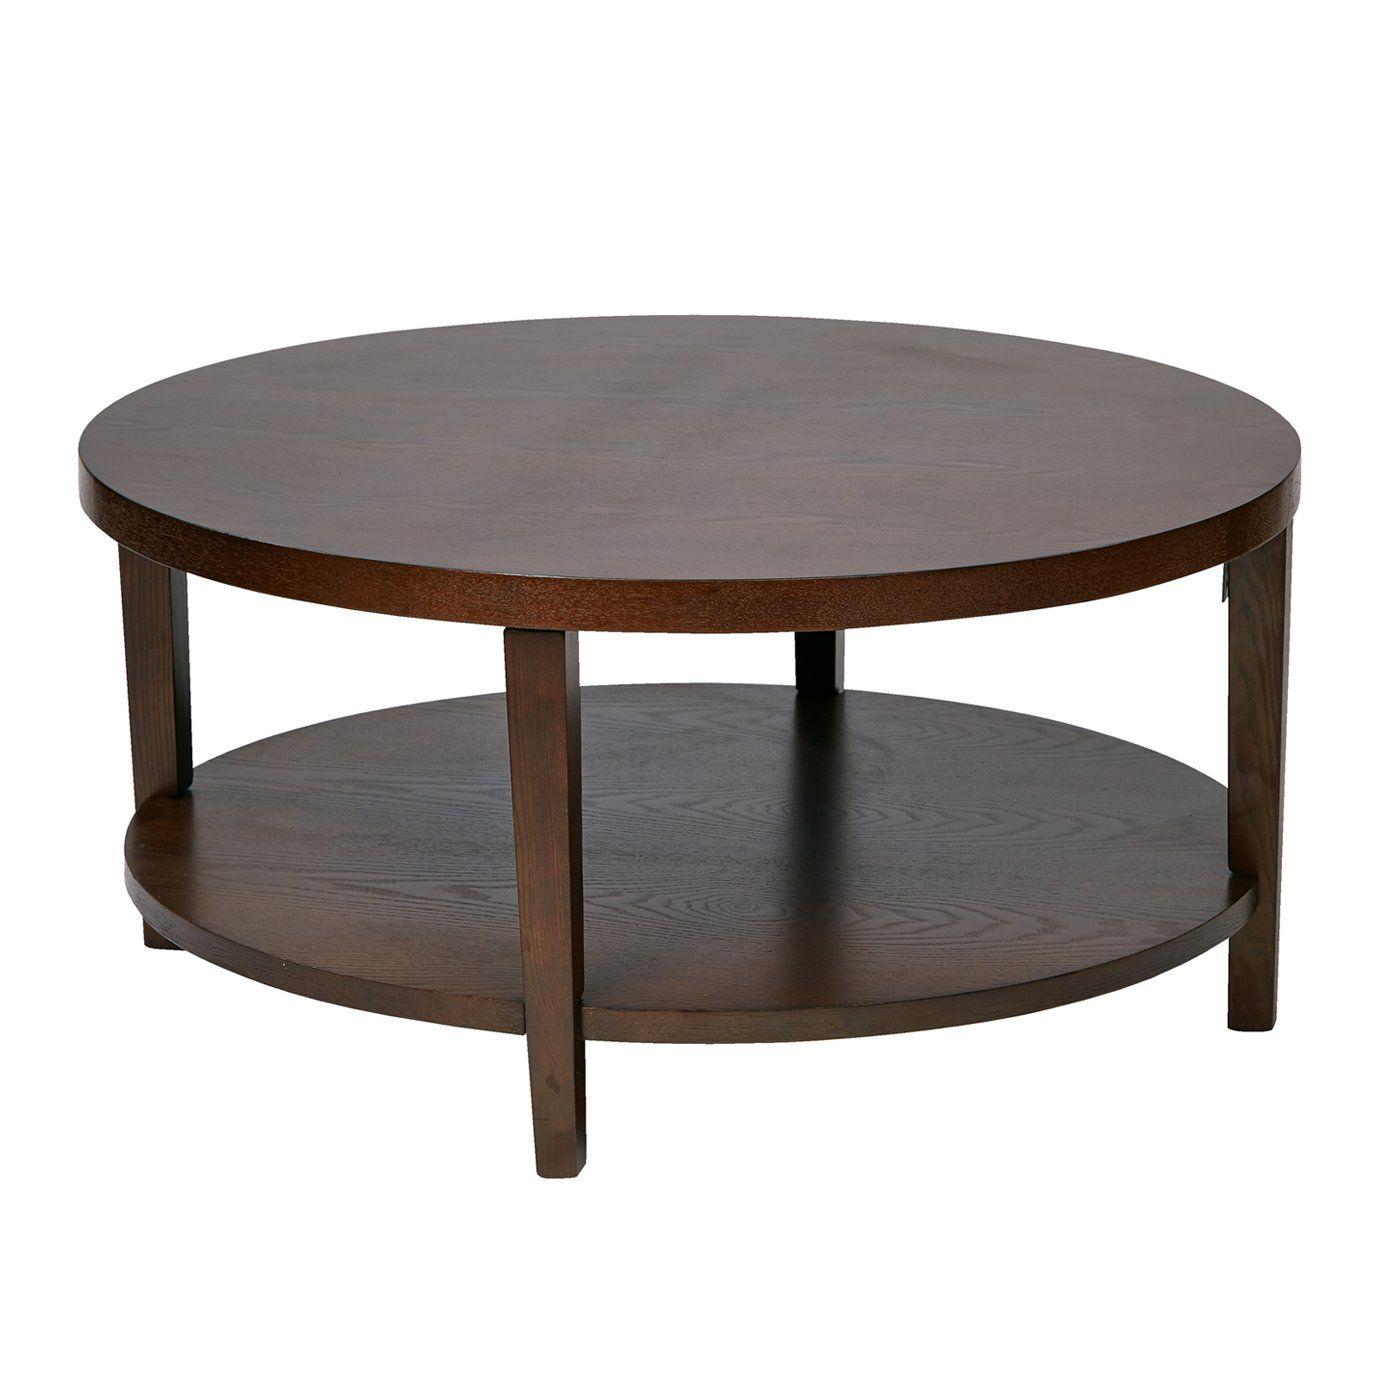 Mrg12 Jpg 1400 1400 Coffee Table Coffee Table Wood Round Wood Coffee Table [ 1400 x 1400 Pixel ]